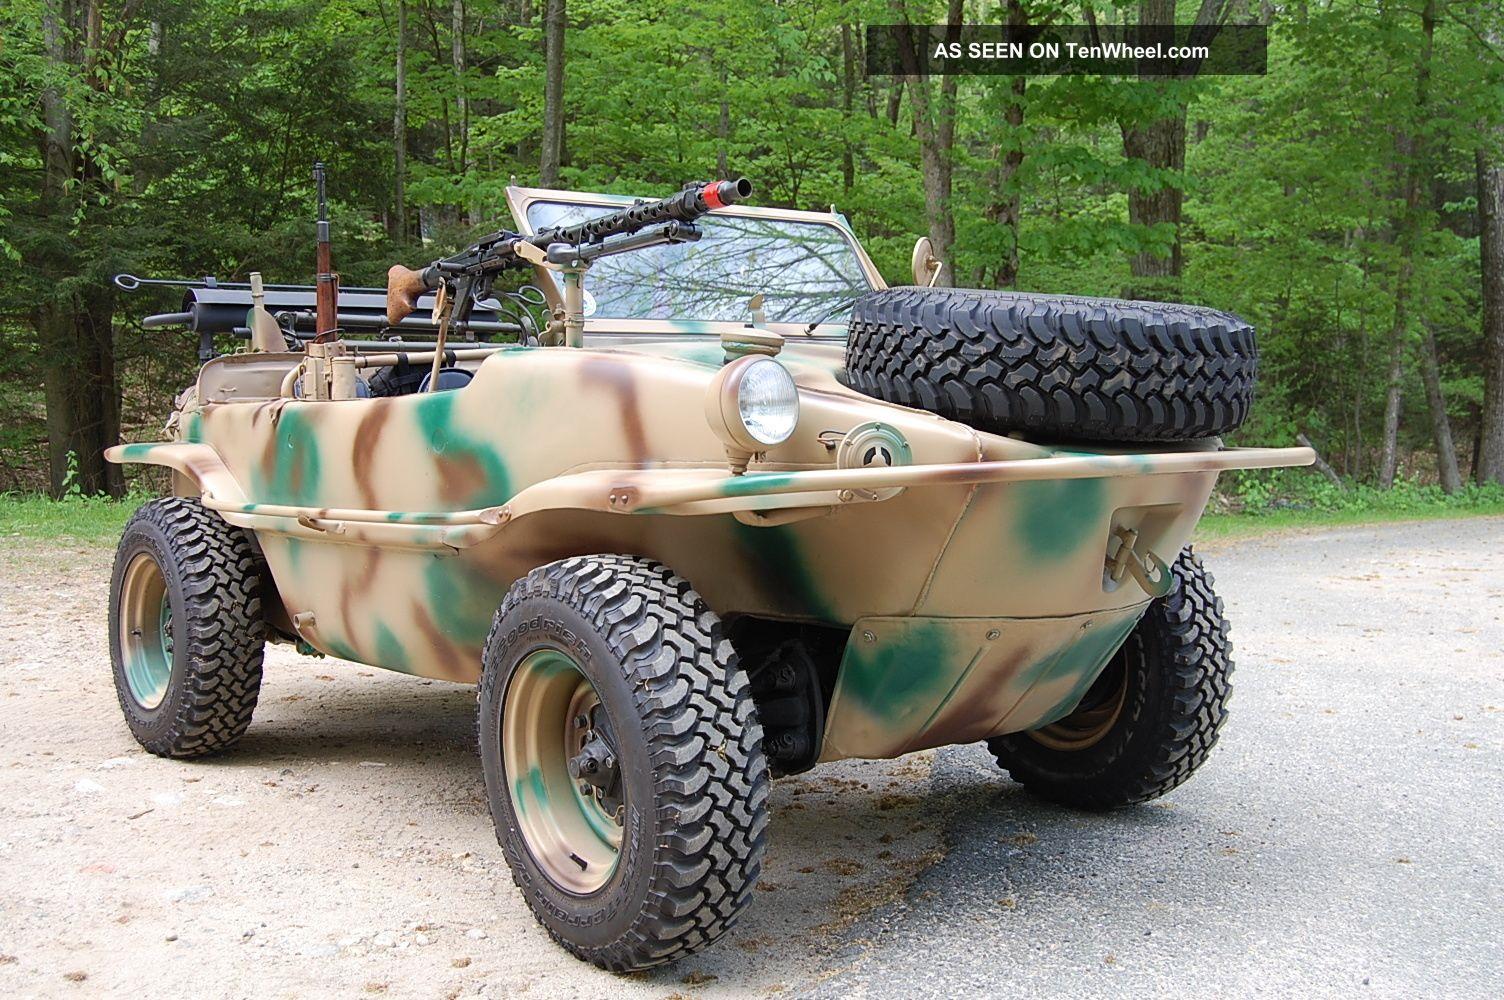 1943 Vw Schwimmwagen German Military Amphibious Vehicle